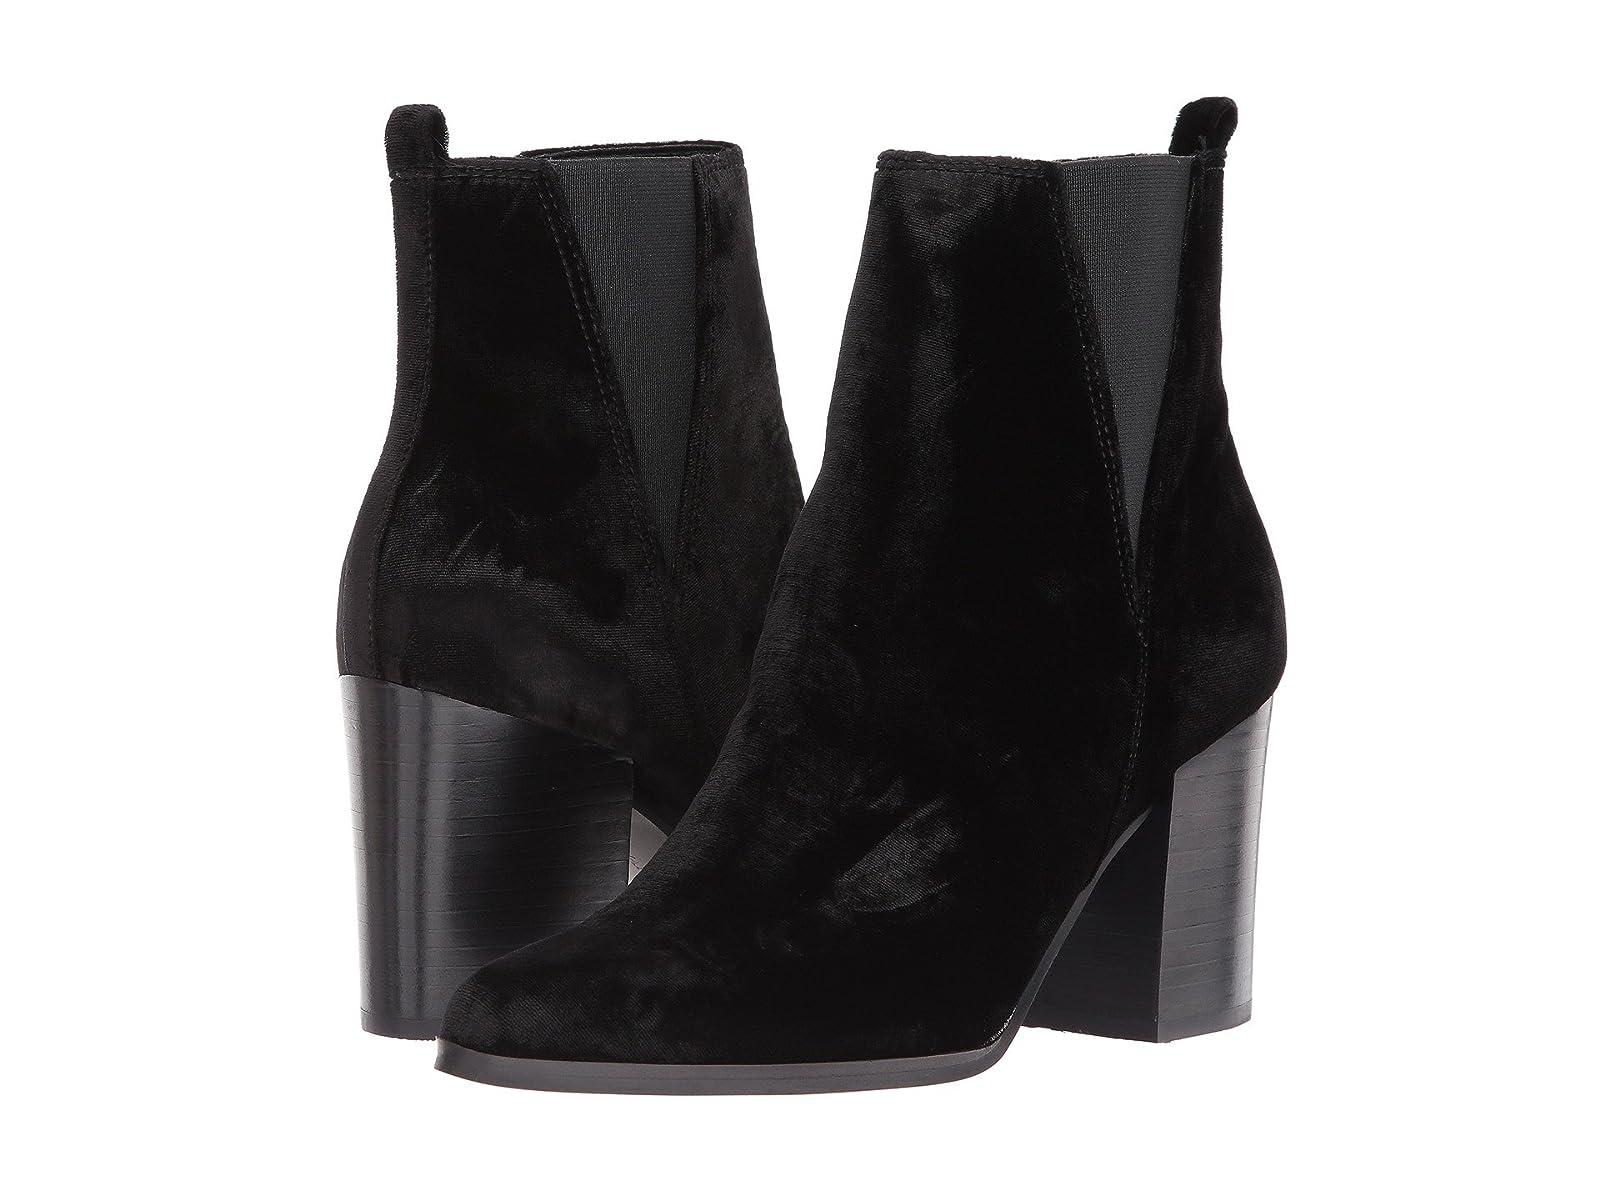 Ivanka Trump AdelCheap and distinctive eye-catching shoes